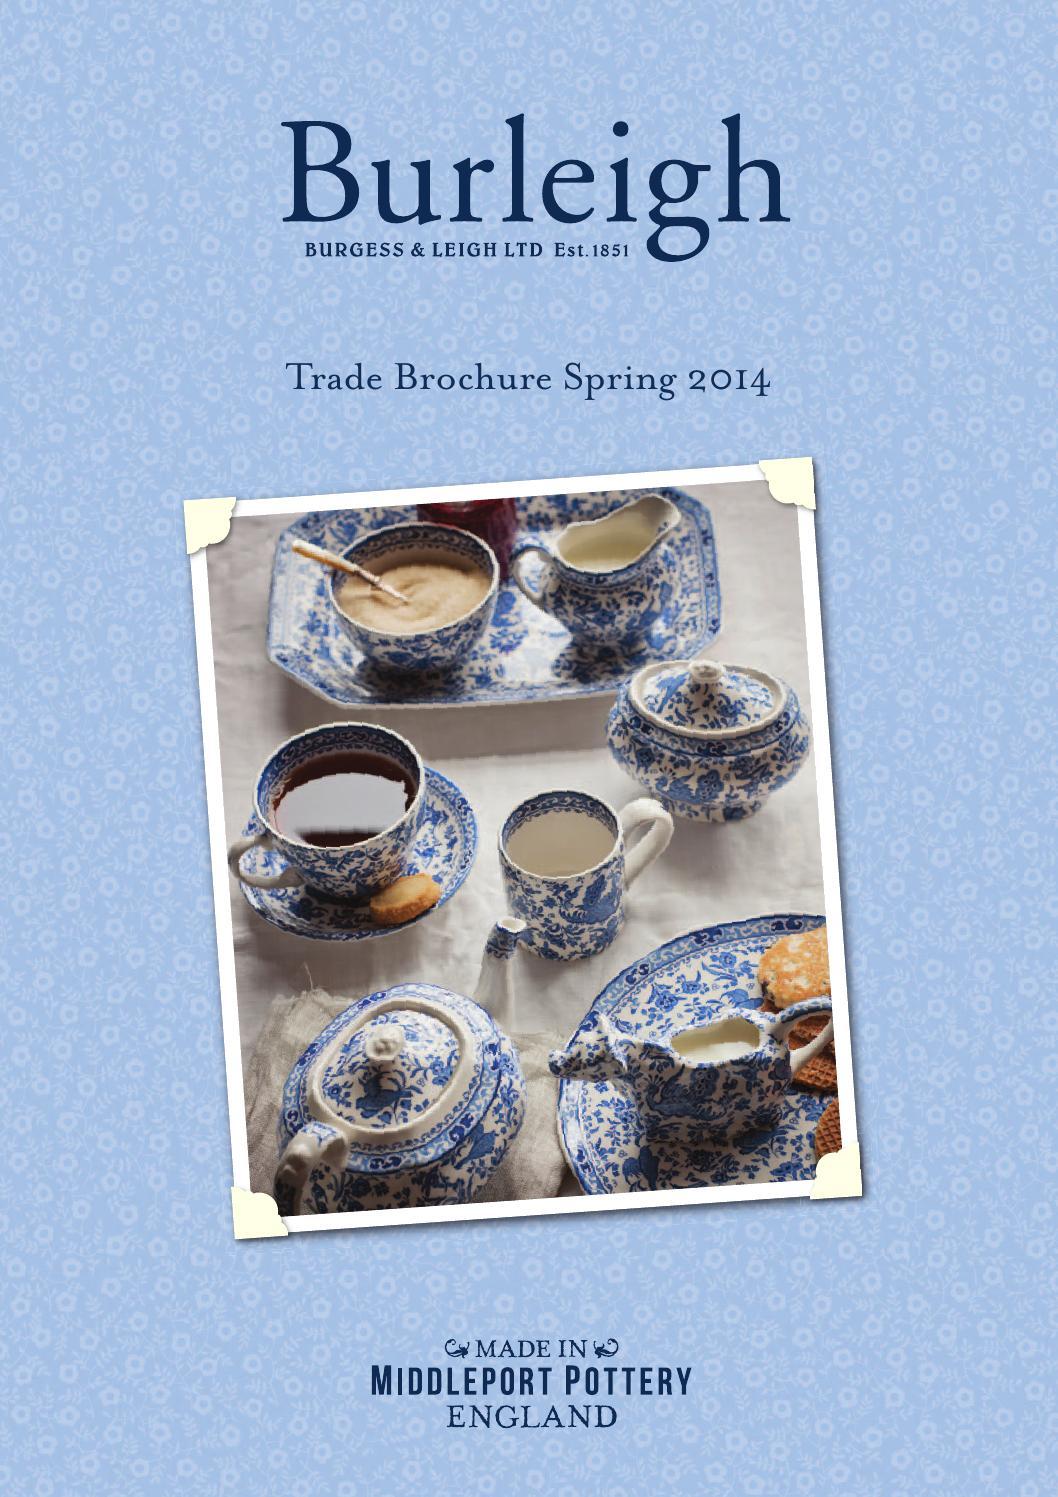 Burleigh pale blue felicity textiles tablecloth gauntlet apron tea towel